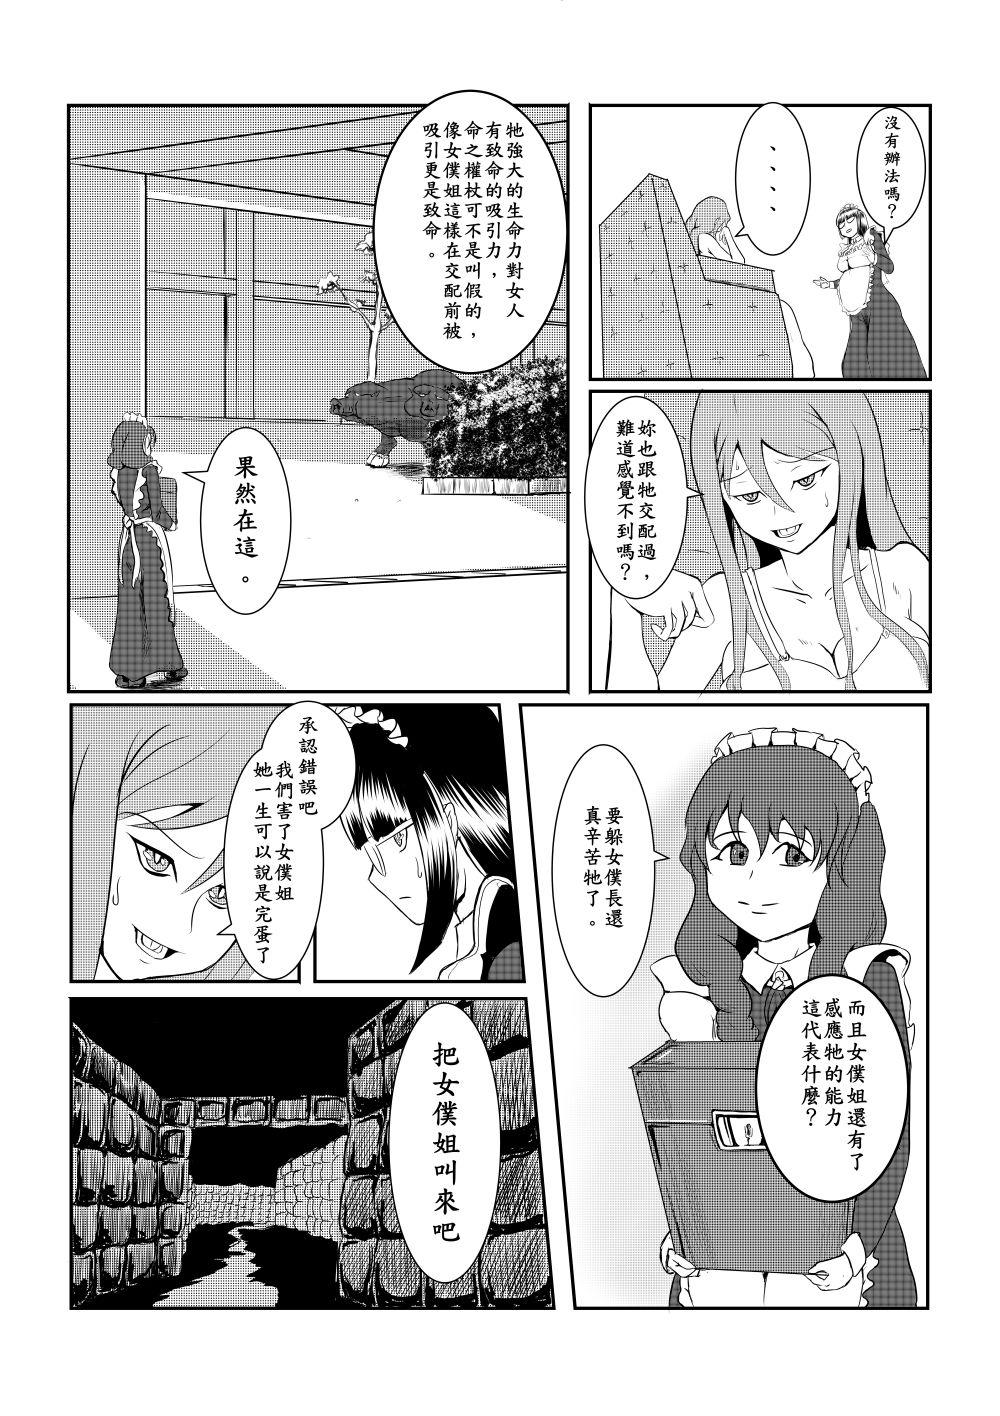 Maou Yuusha - Kachiku Kiki 3 95